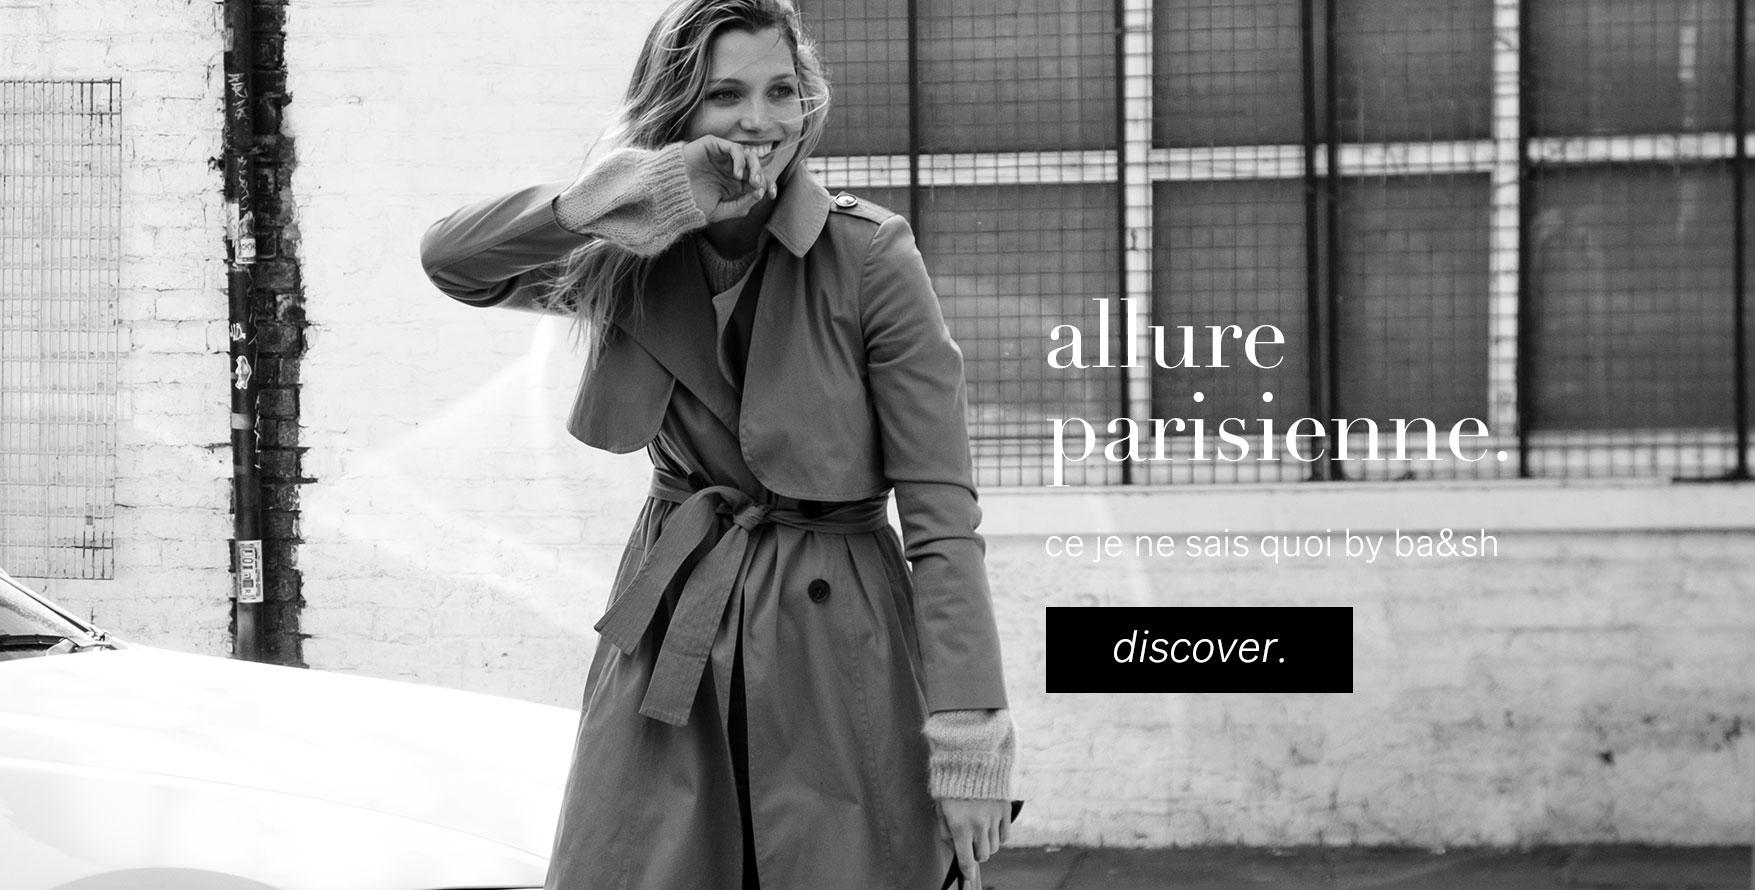 Allure Parisienne